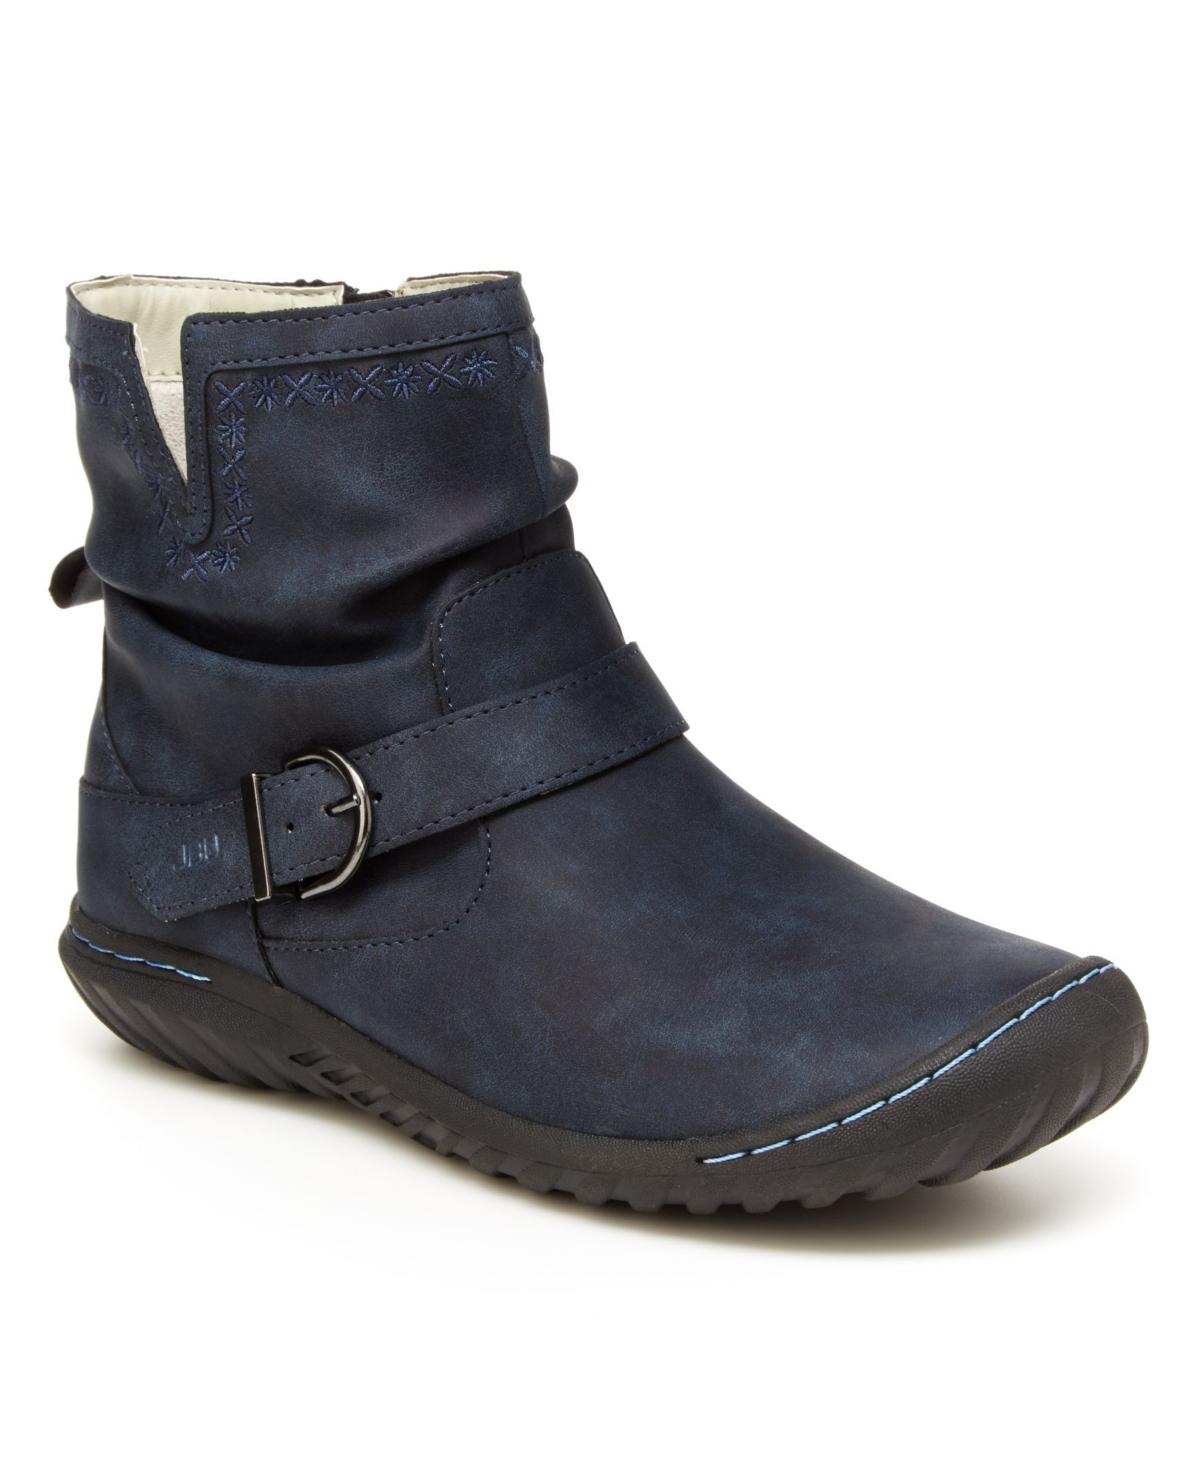 Dottie Women's Ankle Boots Women's Shoes